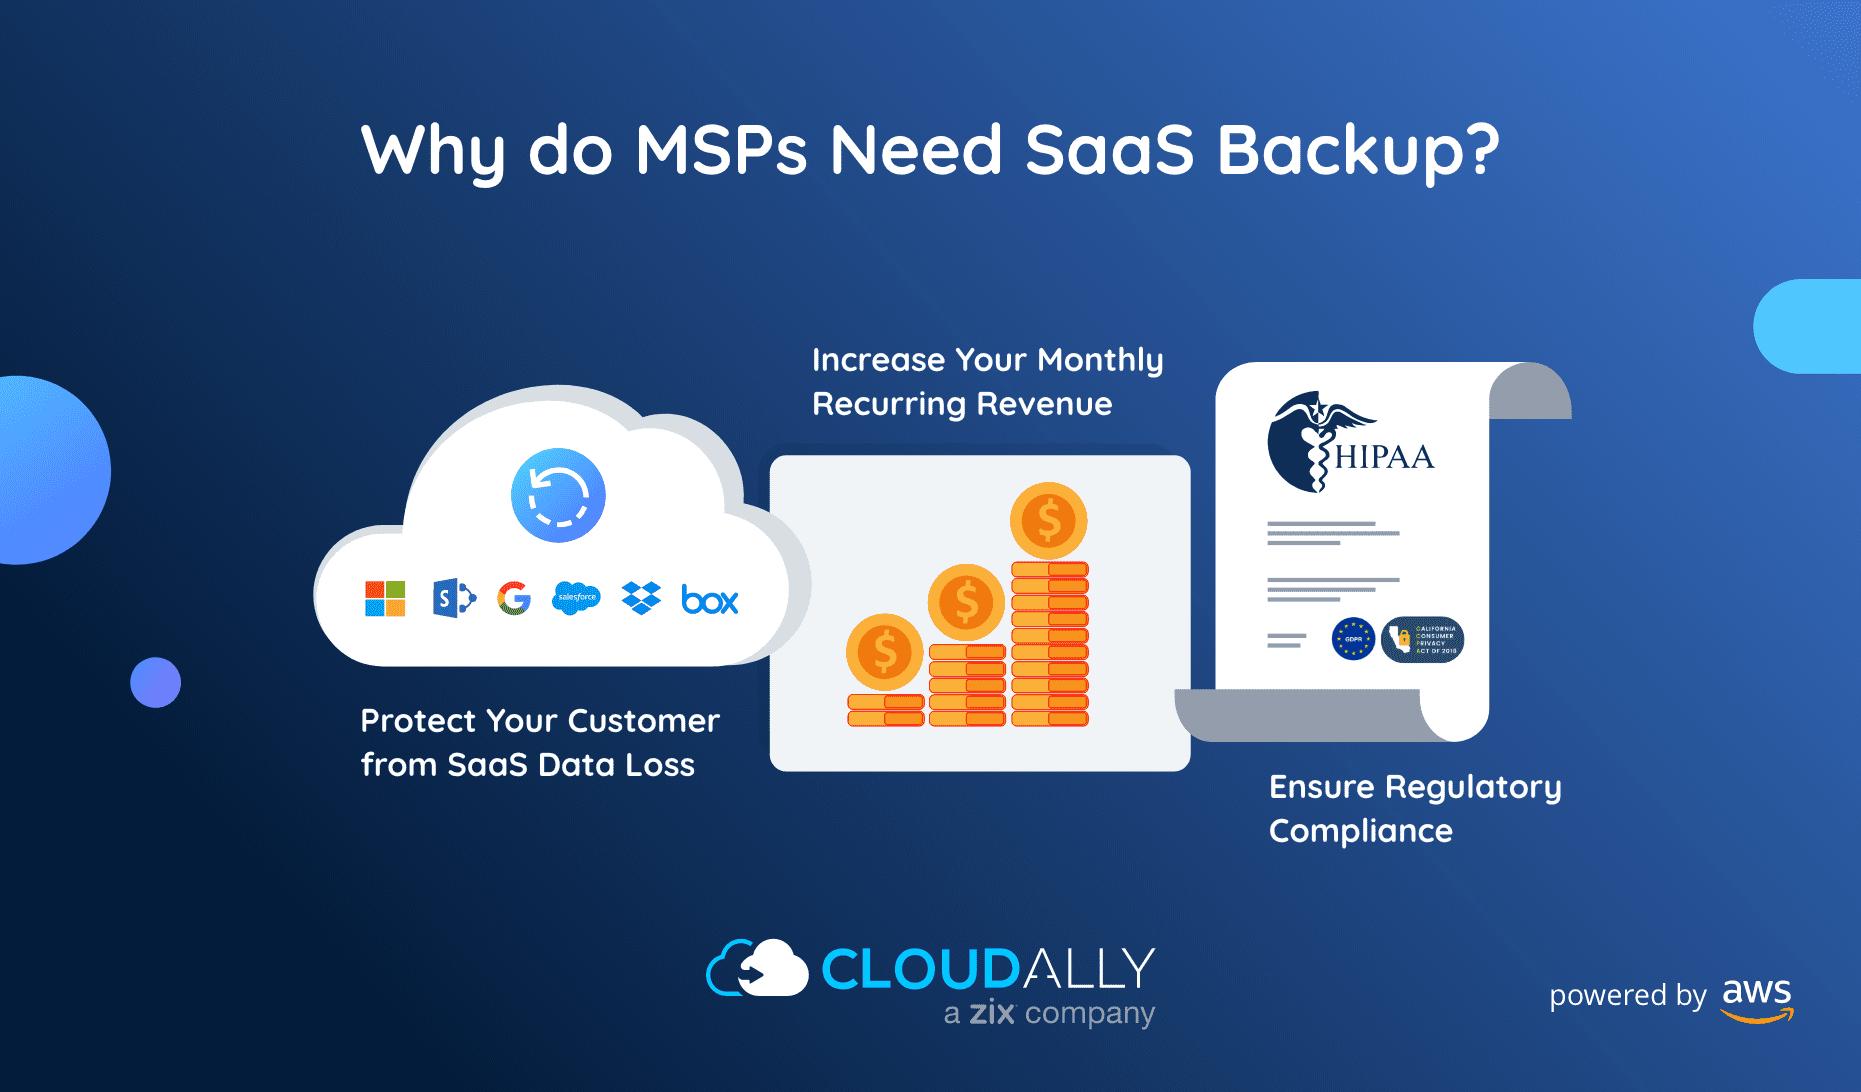 Why MSPs Need Backup